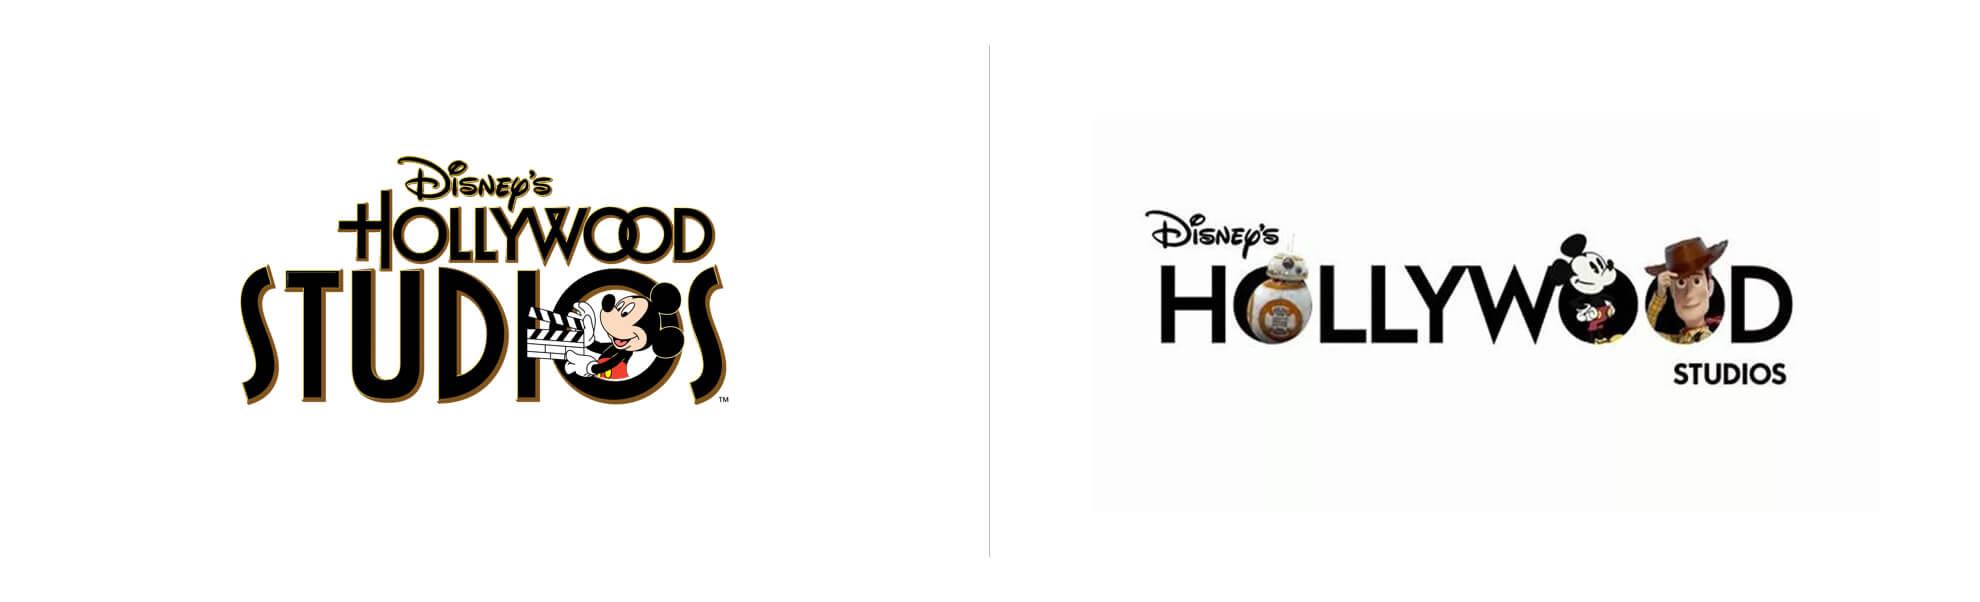 Disney Holywood Studios zmienia logo